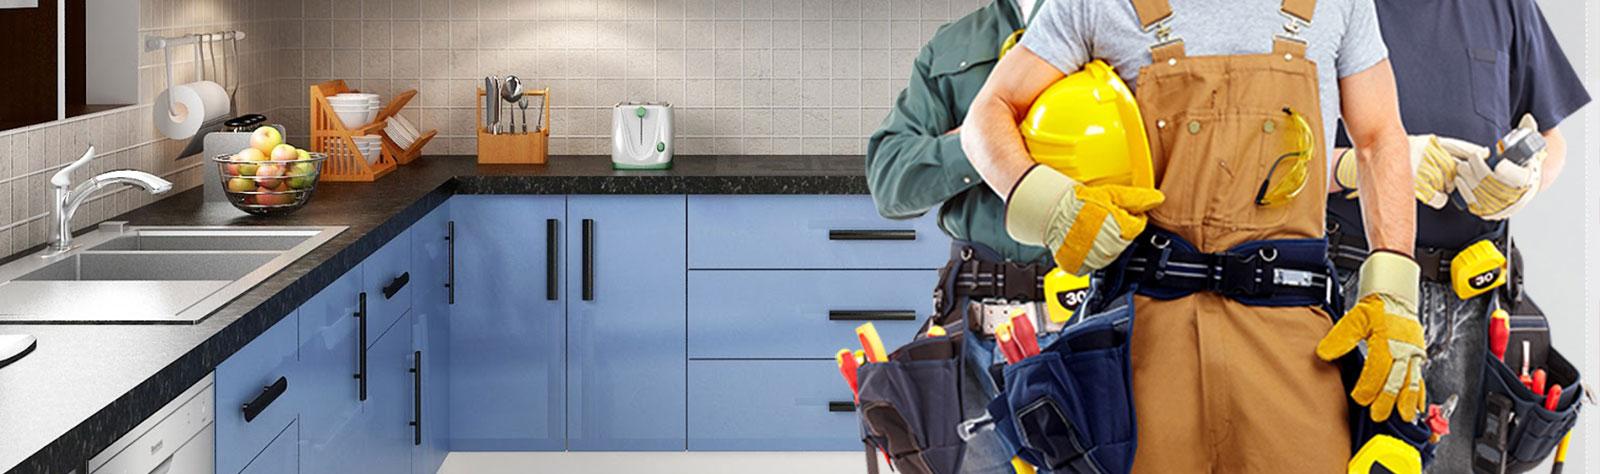 Nathan Groups electrical and plumbing installation Dubai